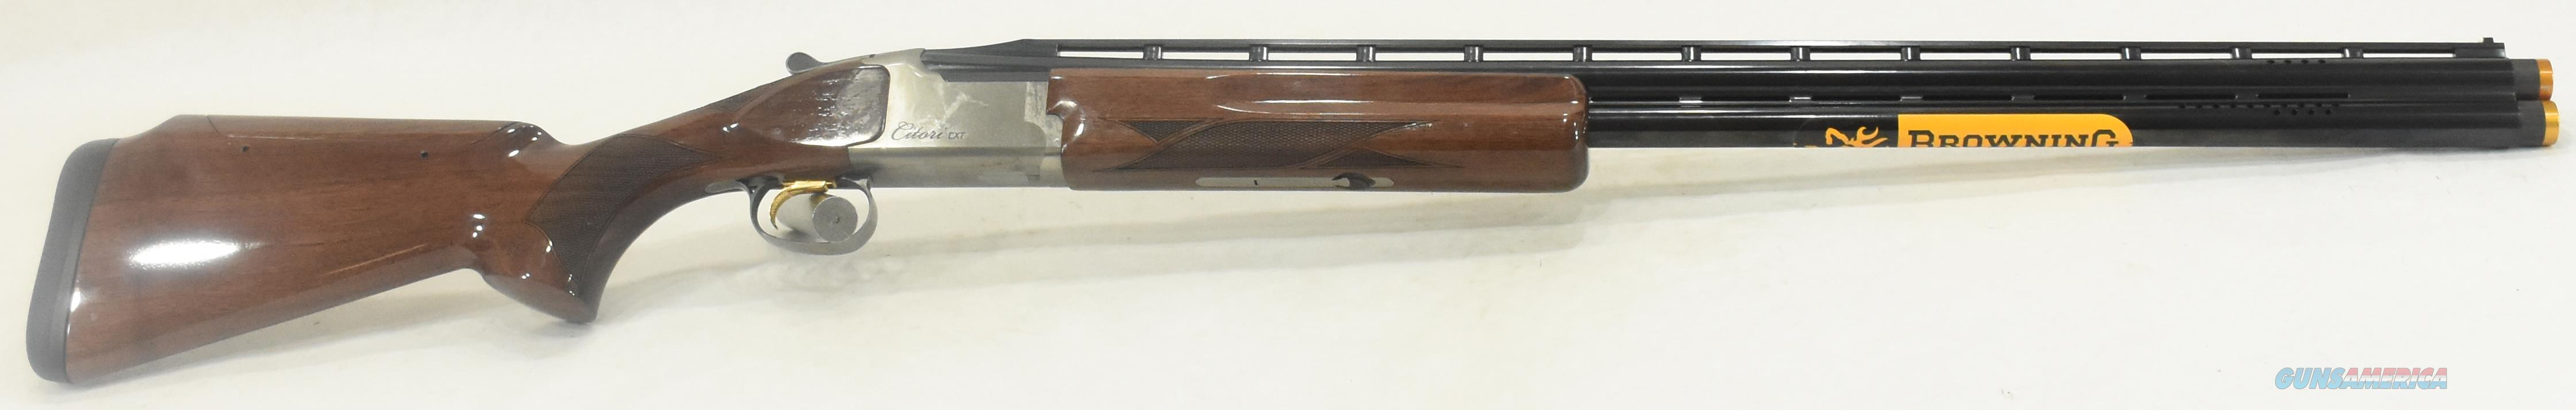 Citori CXT White Adj 12Ga 30-3In 018182326  Guns > Shotguns > Browning Shotguns > Over Unders > Citori > Hunting